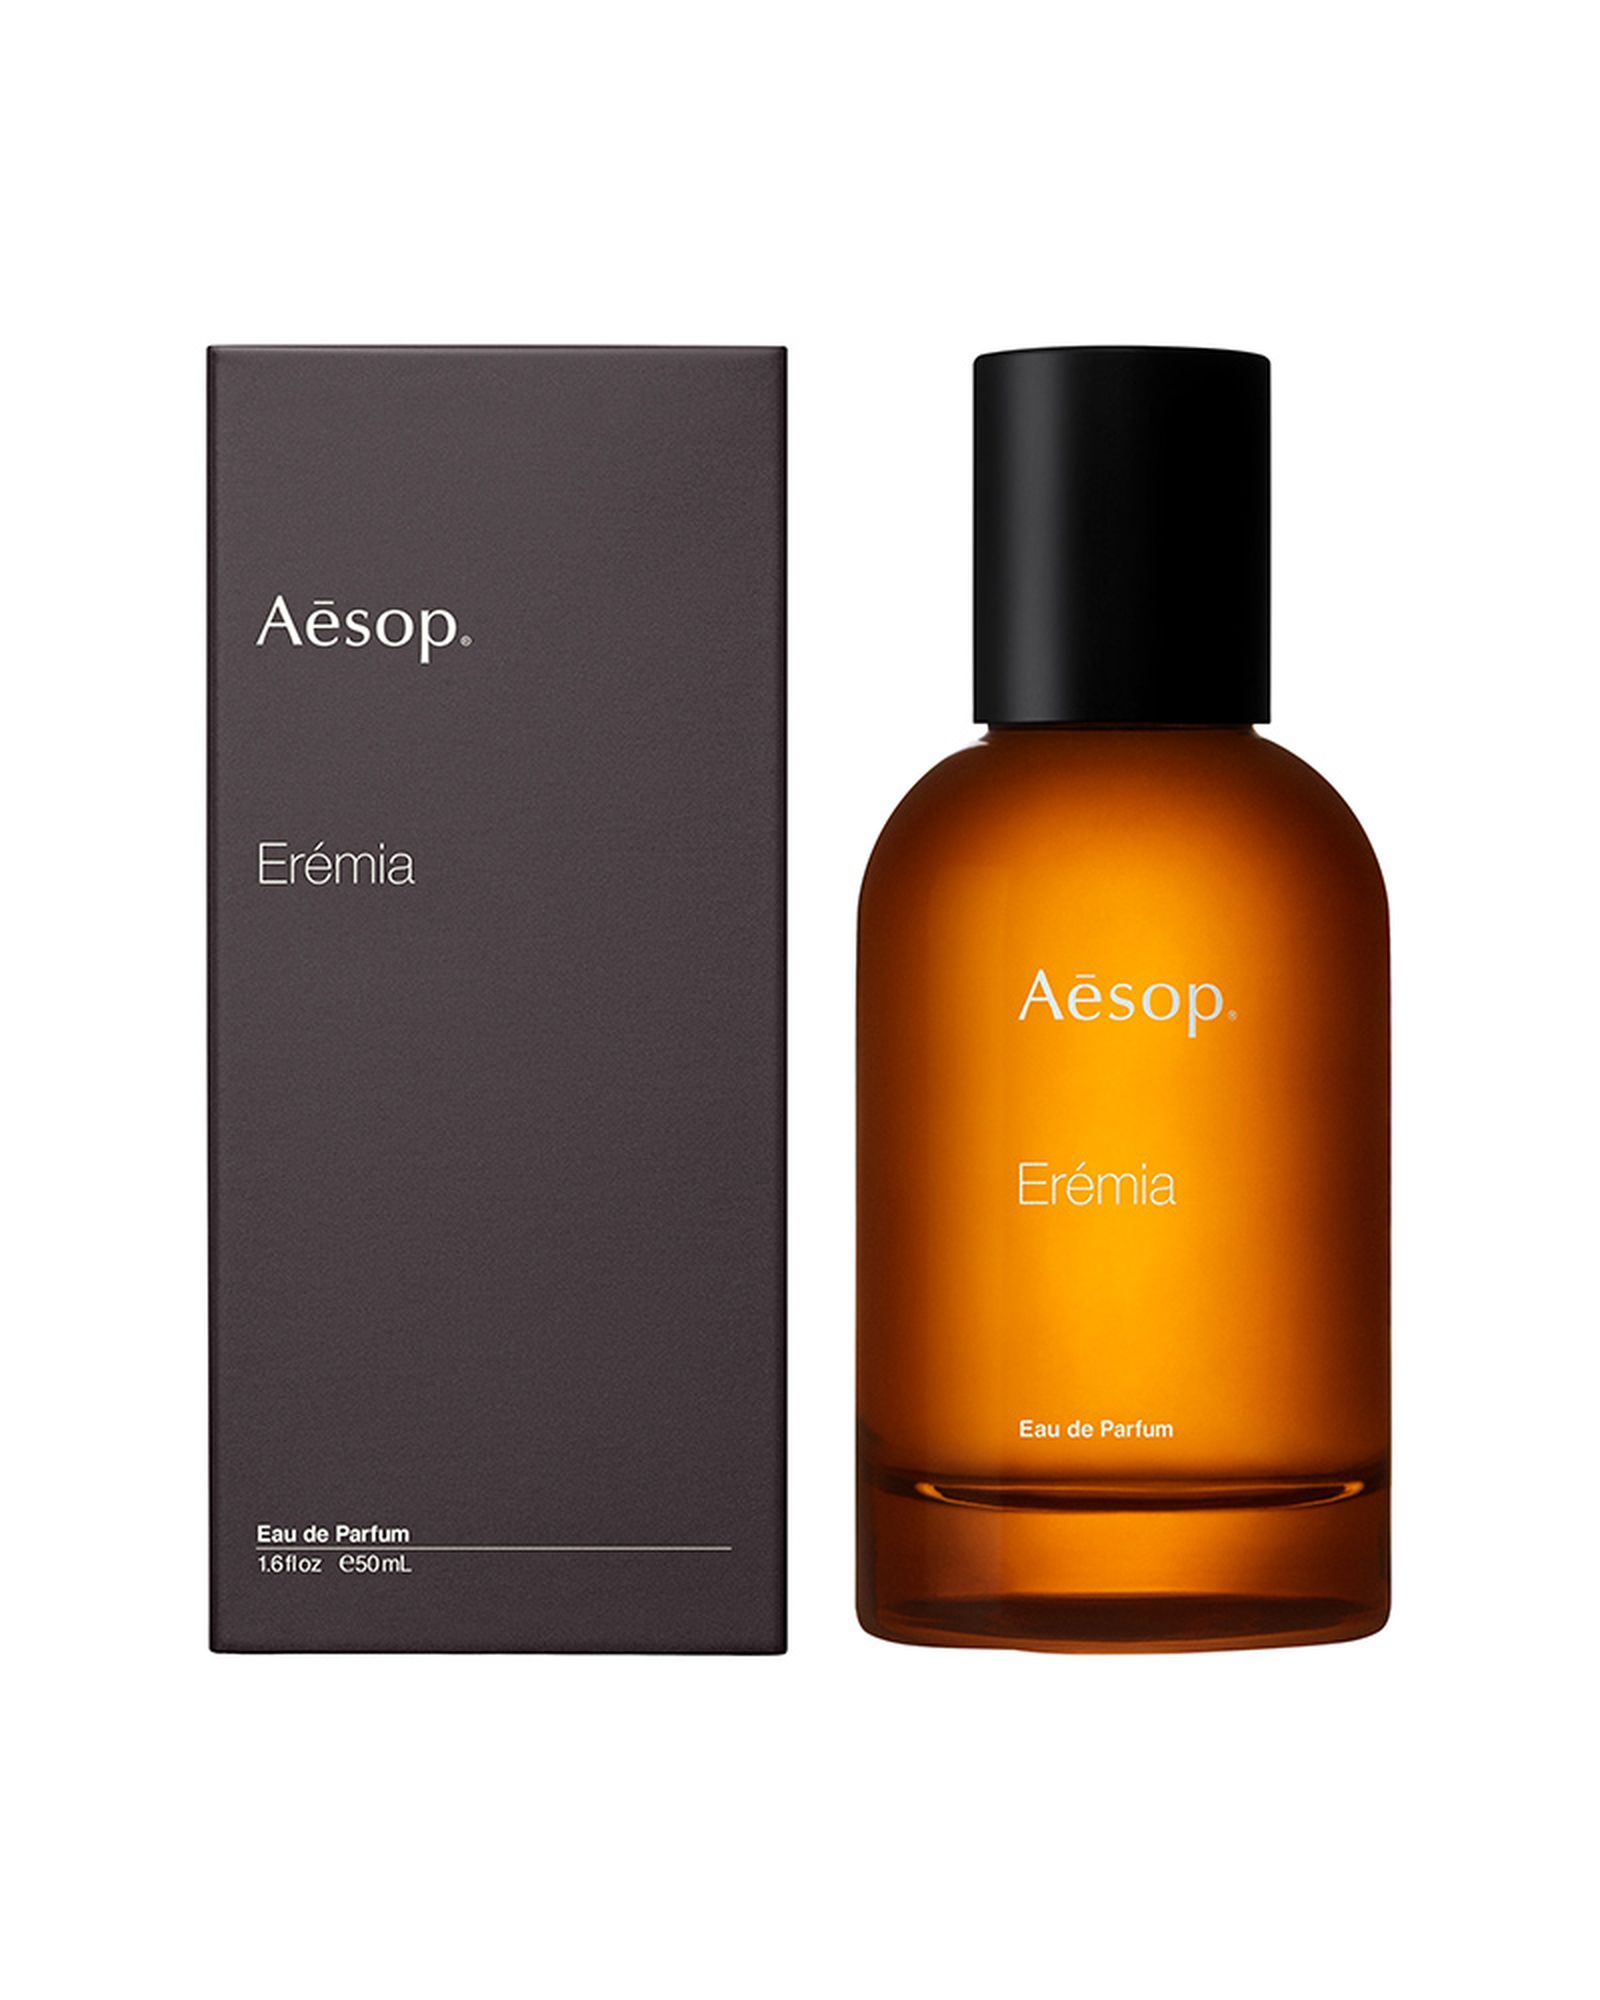 aesop-othertopias-fragrance-collection-02